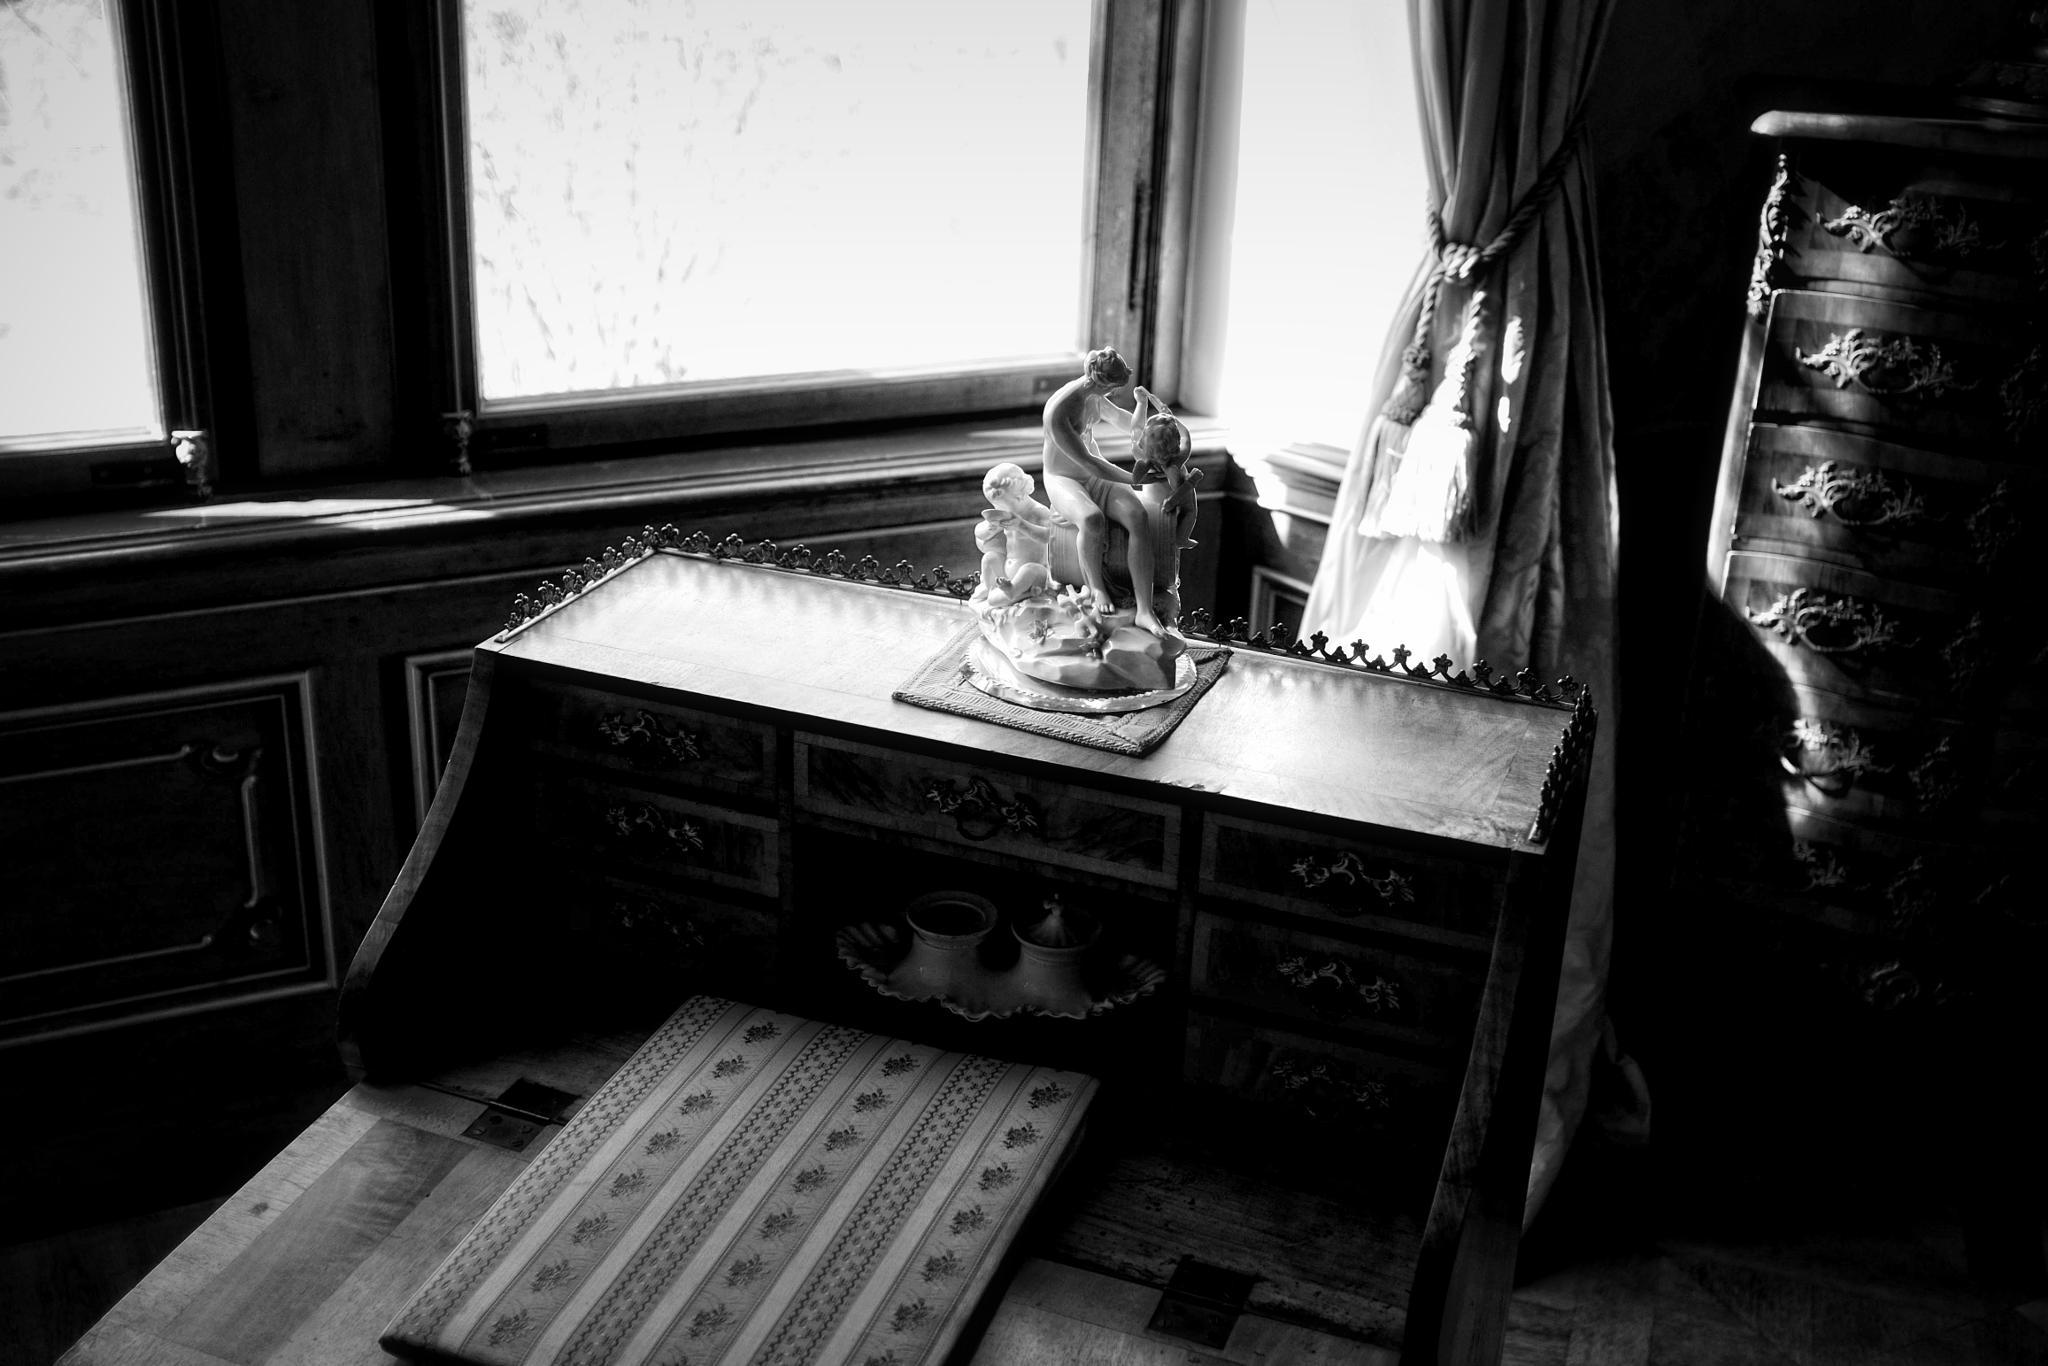 Long Time Ago by peterkryzun